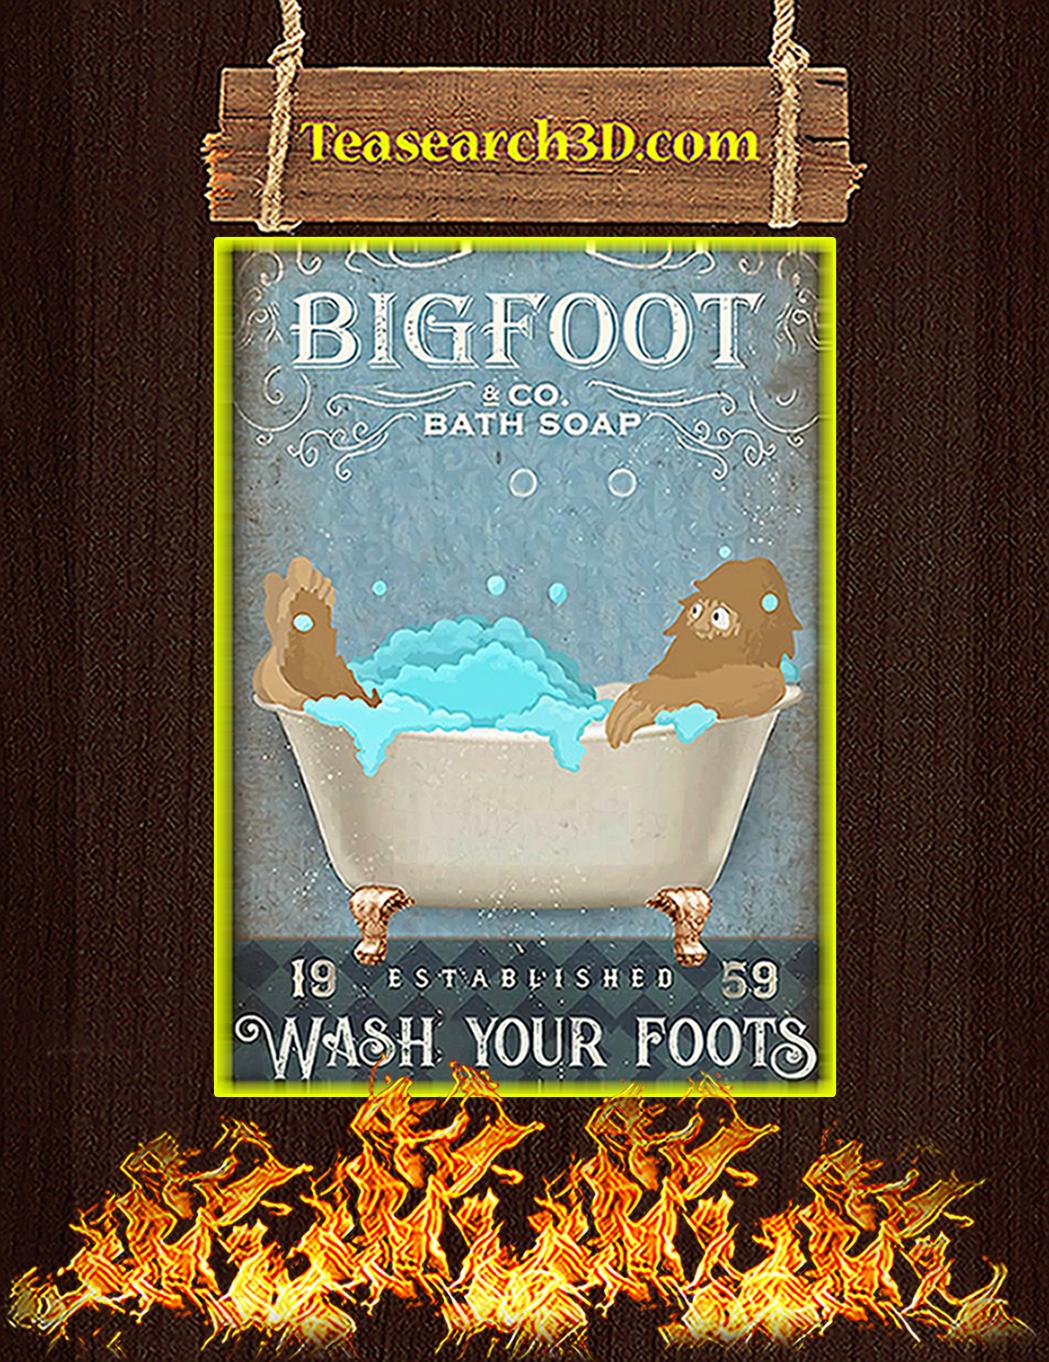 Bigfoot bath soap co wash your foots poster A1